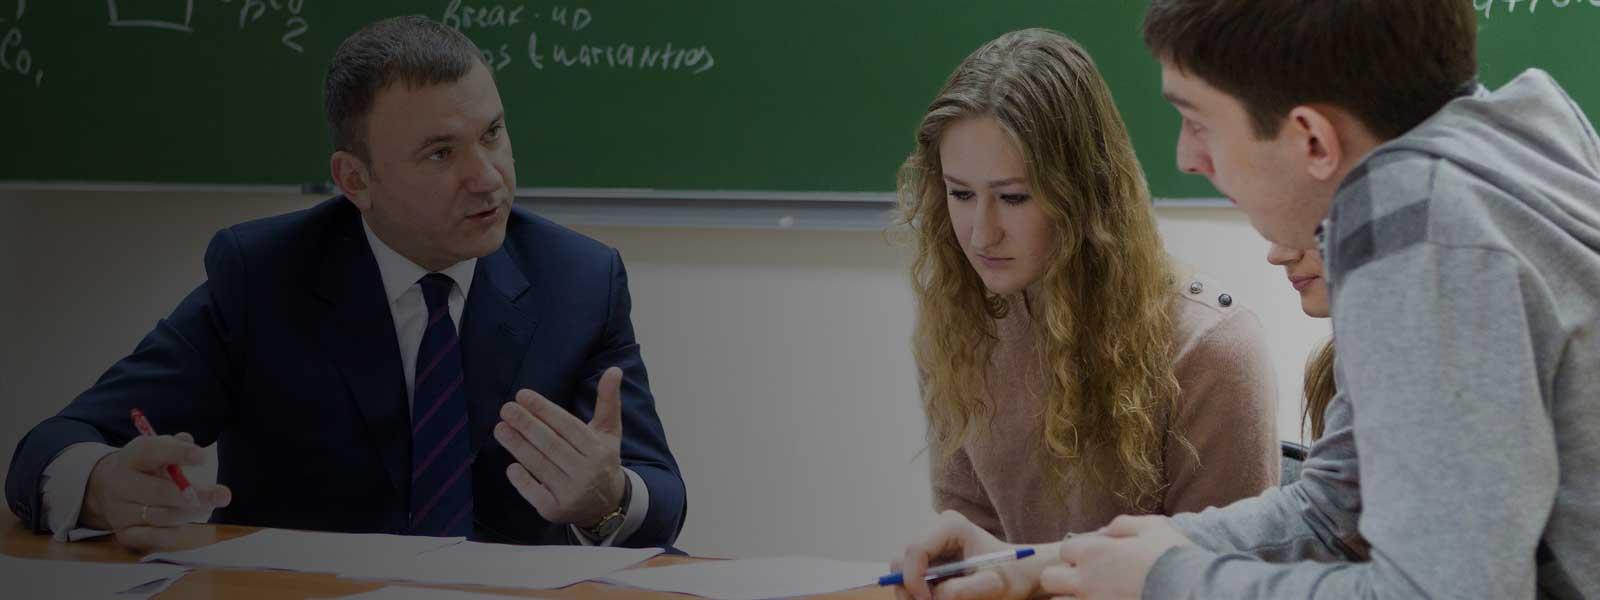 Legal Education University relations hero